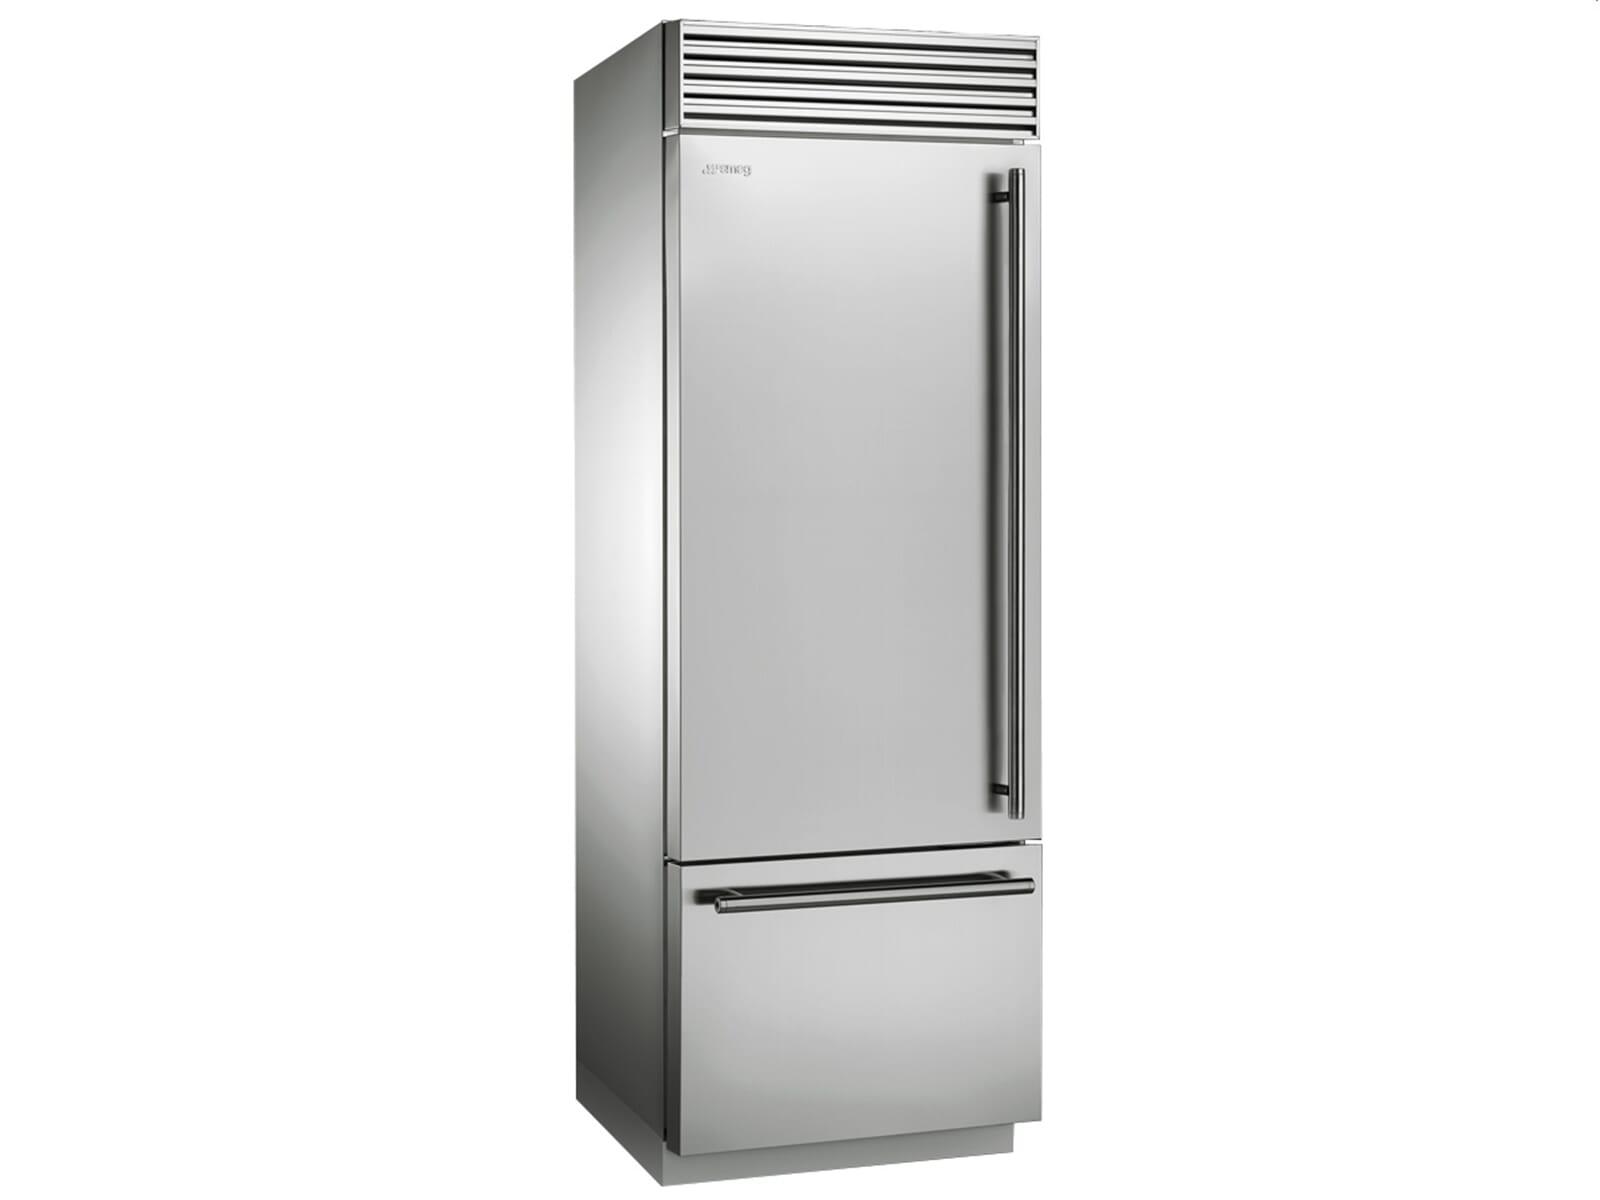 Smeg Kühlschrank Kaufen : Smeg kühlschrank günstig smeg scd60imx8 kombi standherd edelstahl